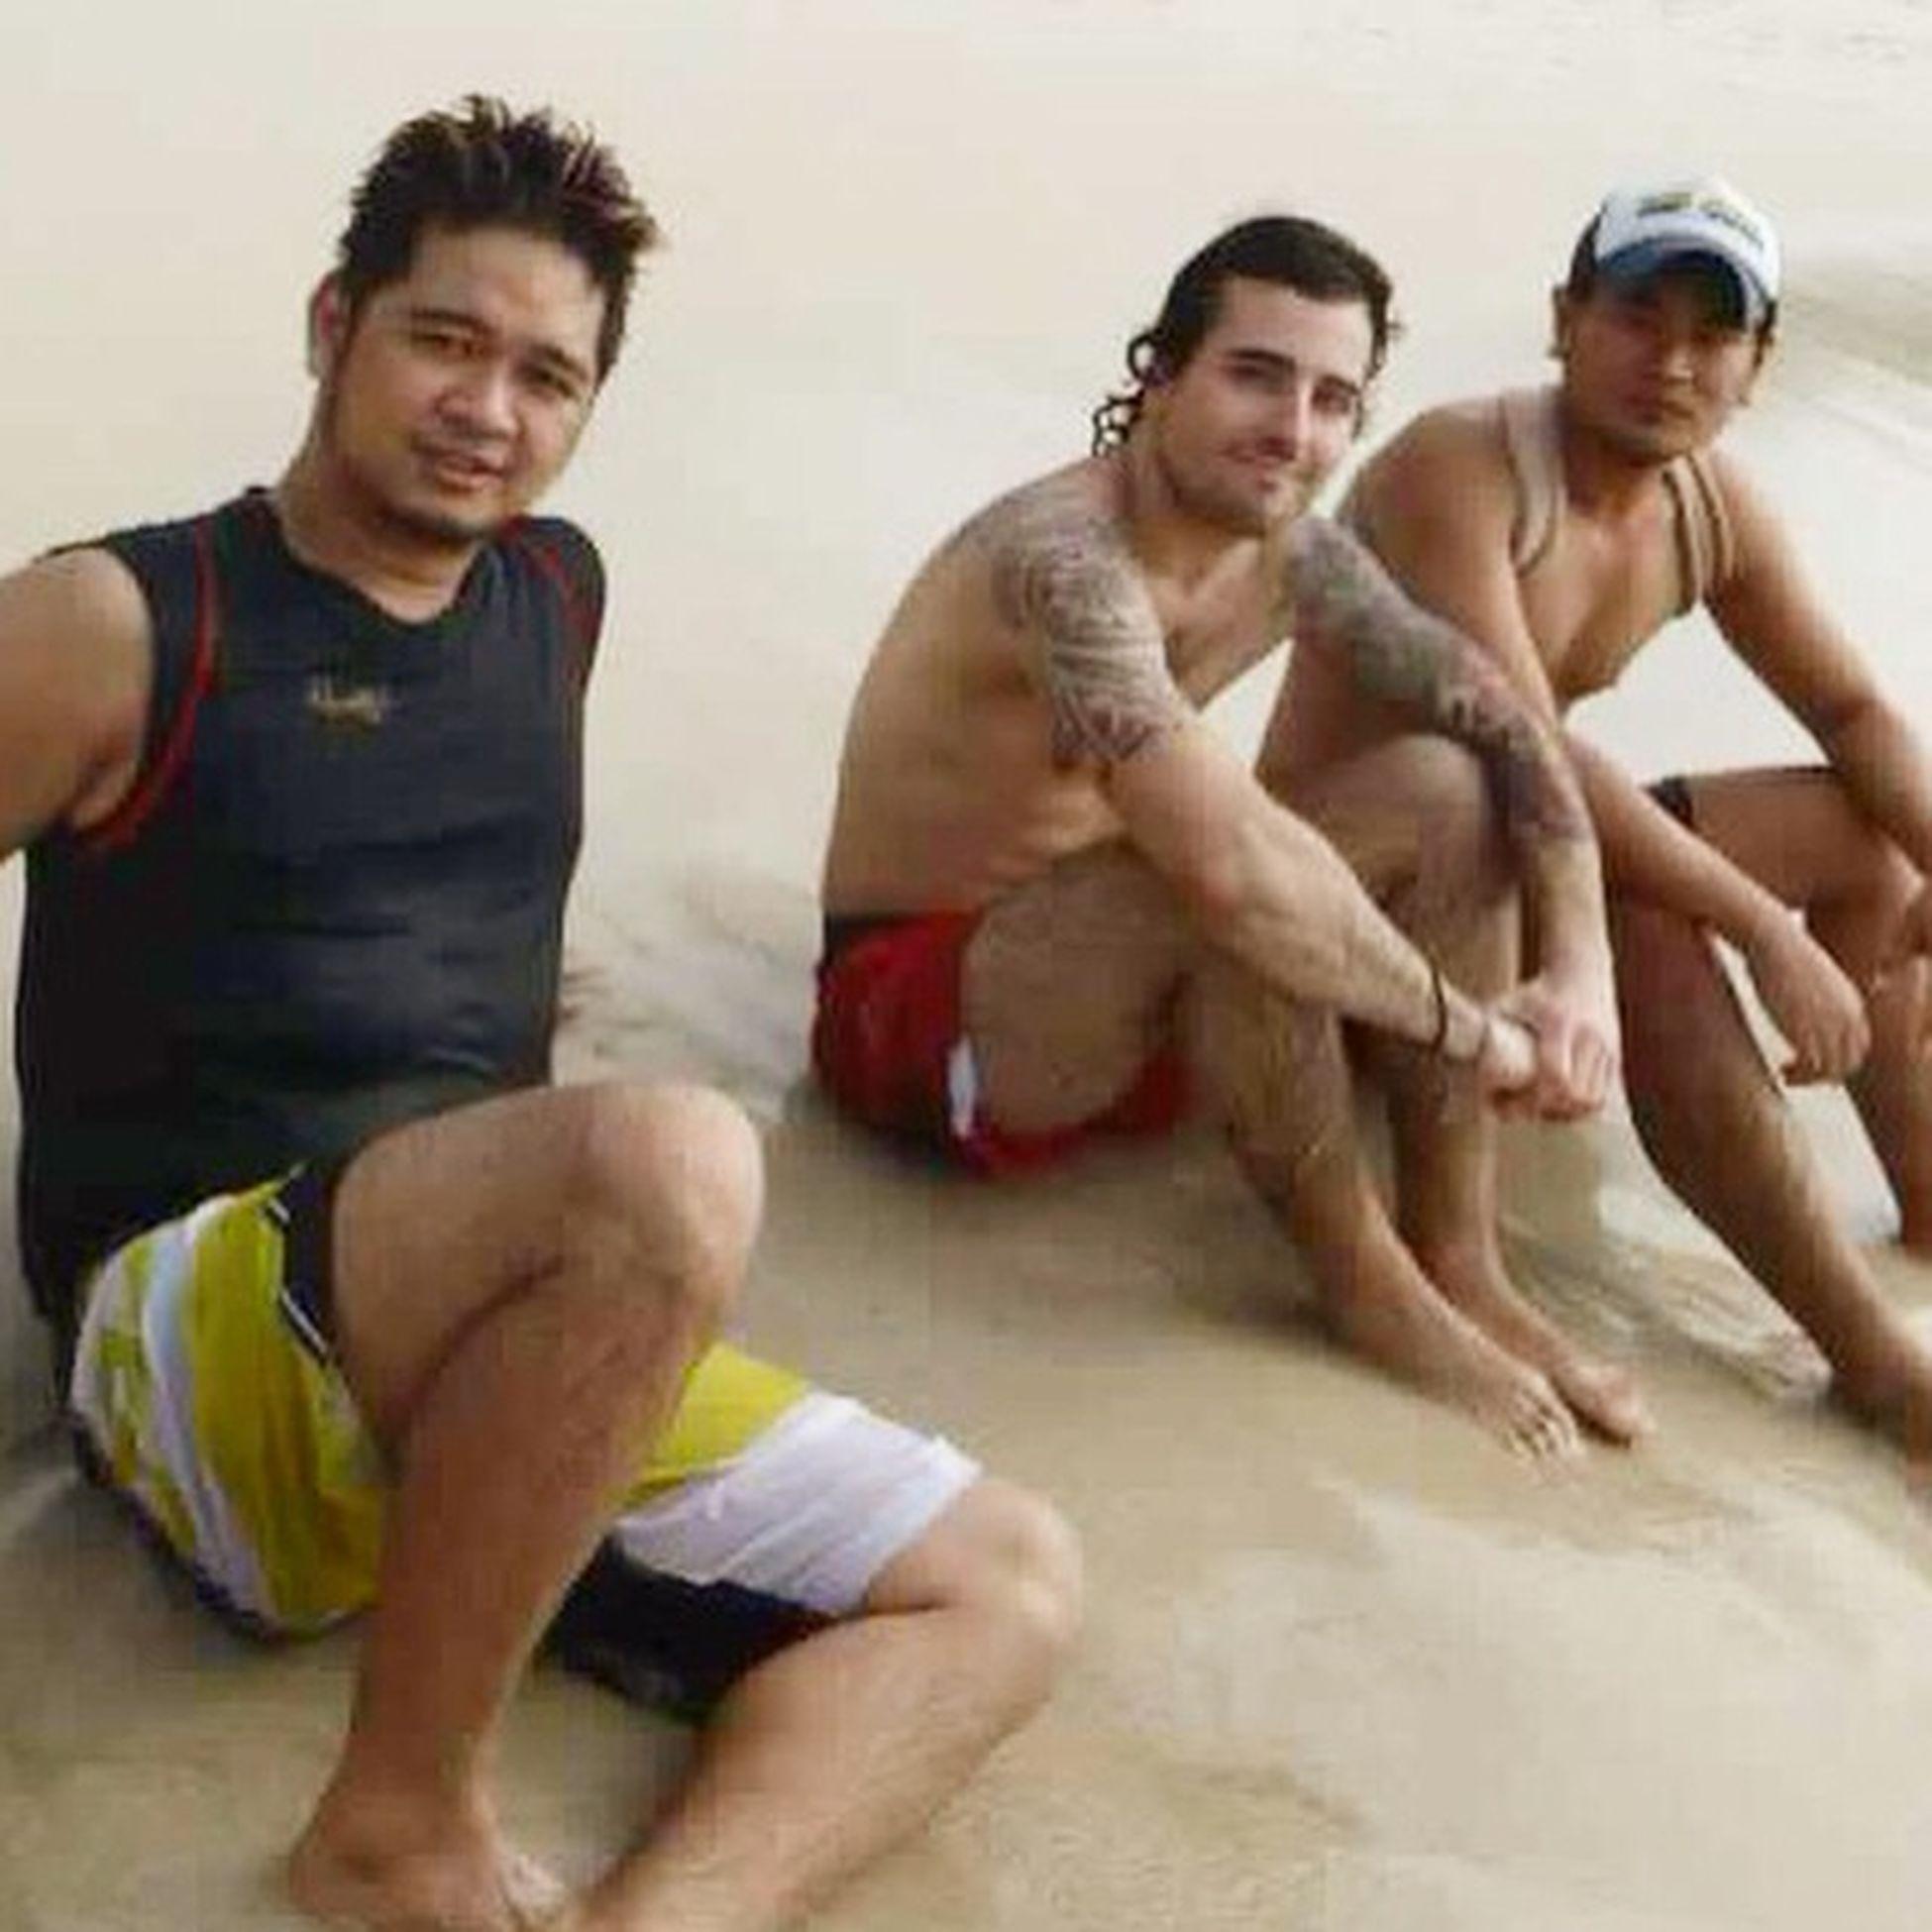 With beach buddies at Freedombeach Phuket djjuan and giovanni coratela